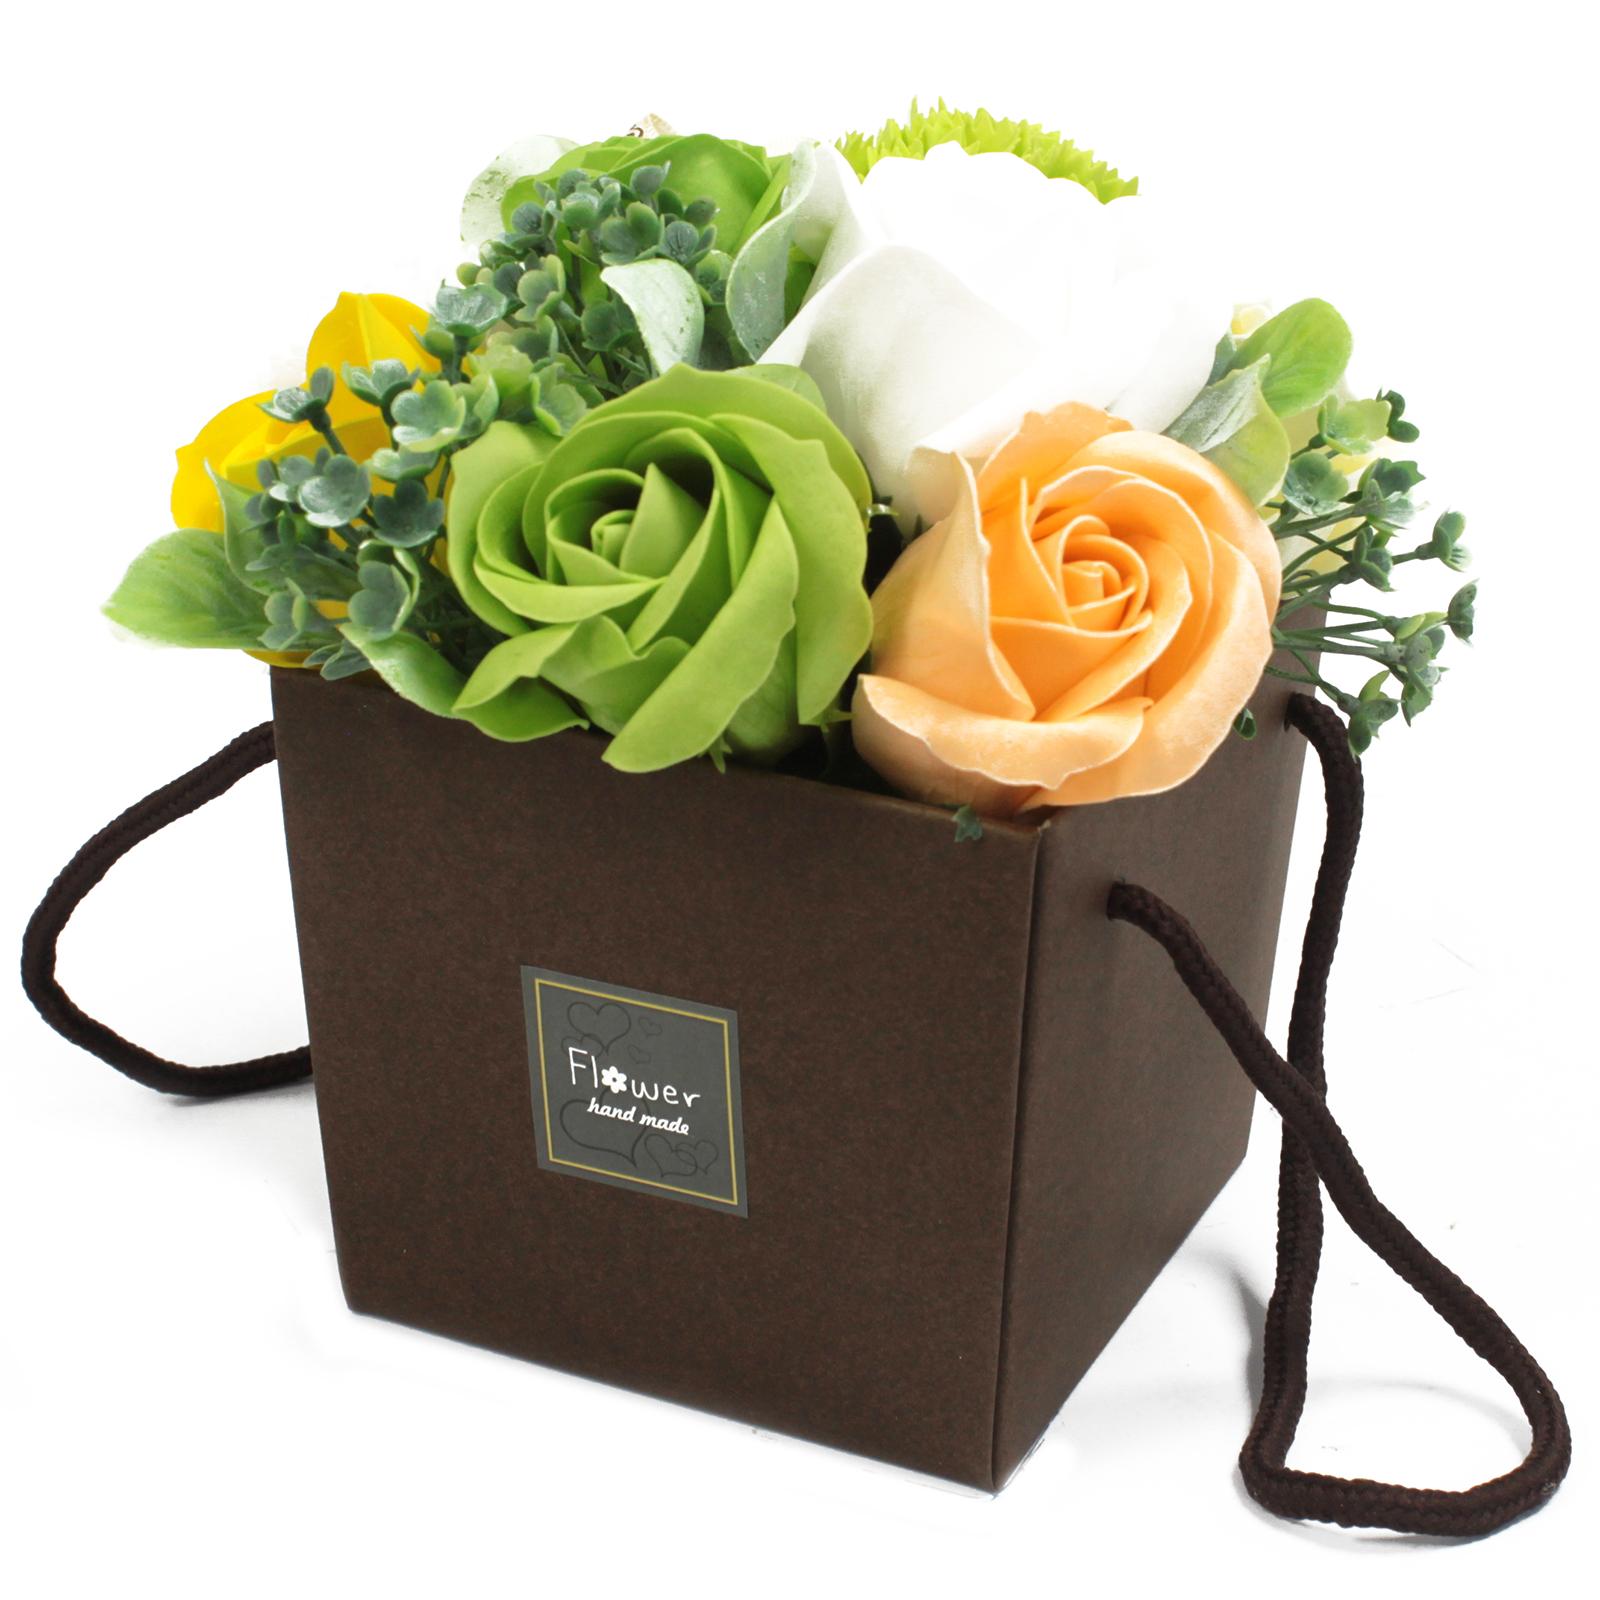 1x Soap Flower Bouqet - Spring Flowers